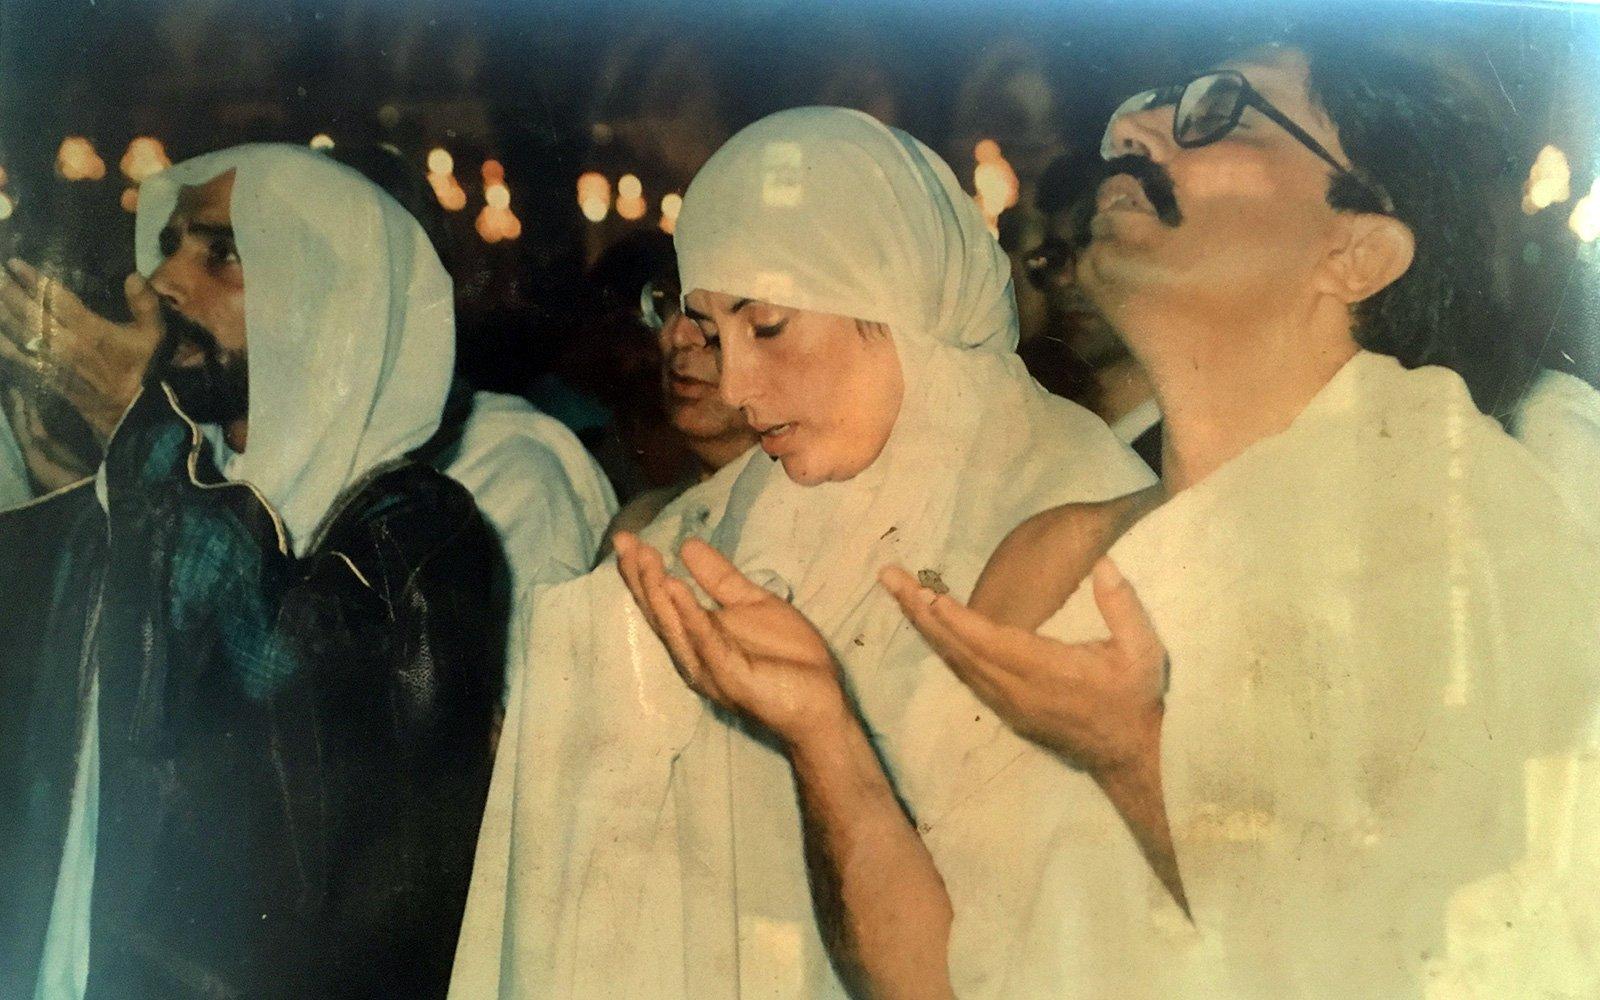 Benazir bhutto autopsy photos Assassination of Benazir Bhutto - Wikipedia